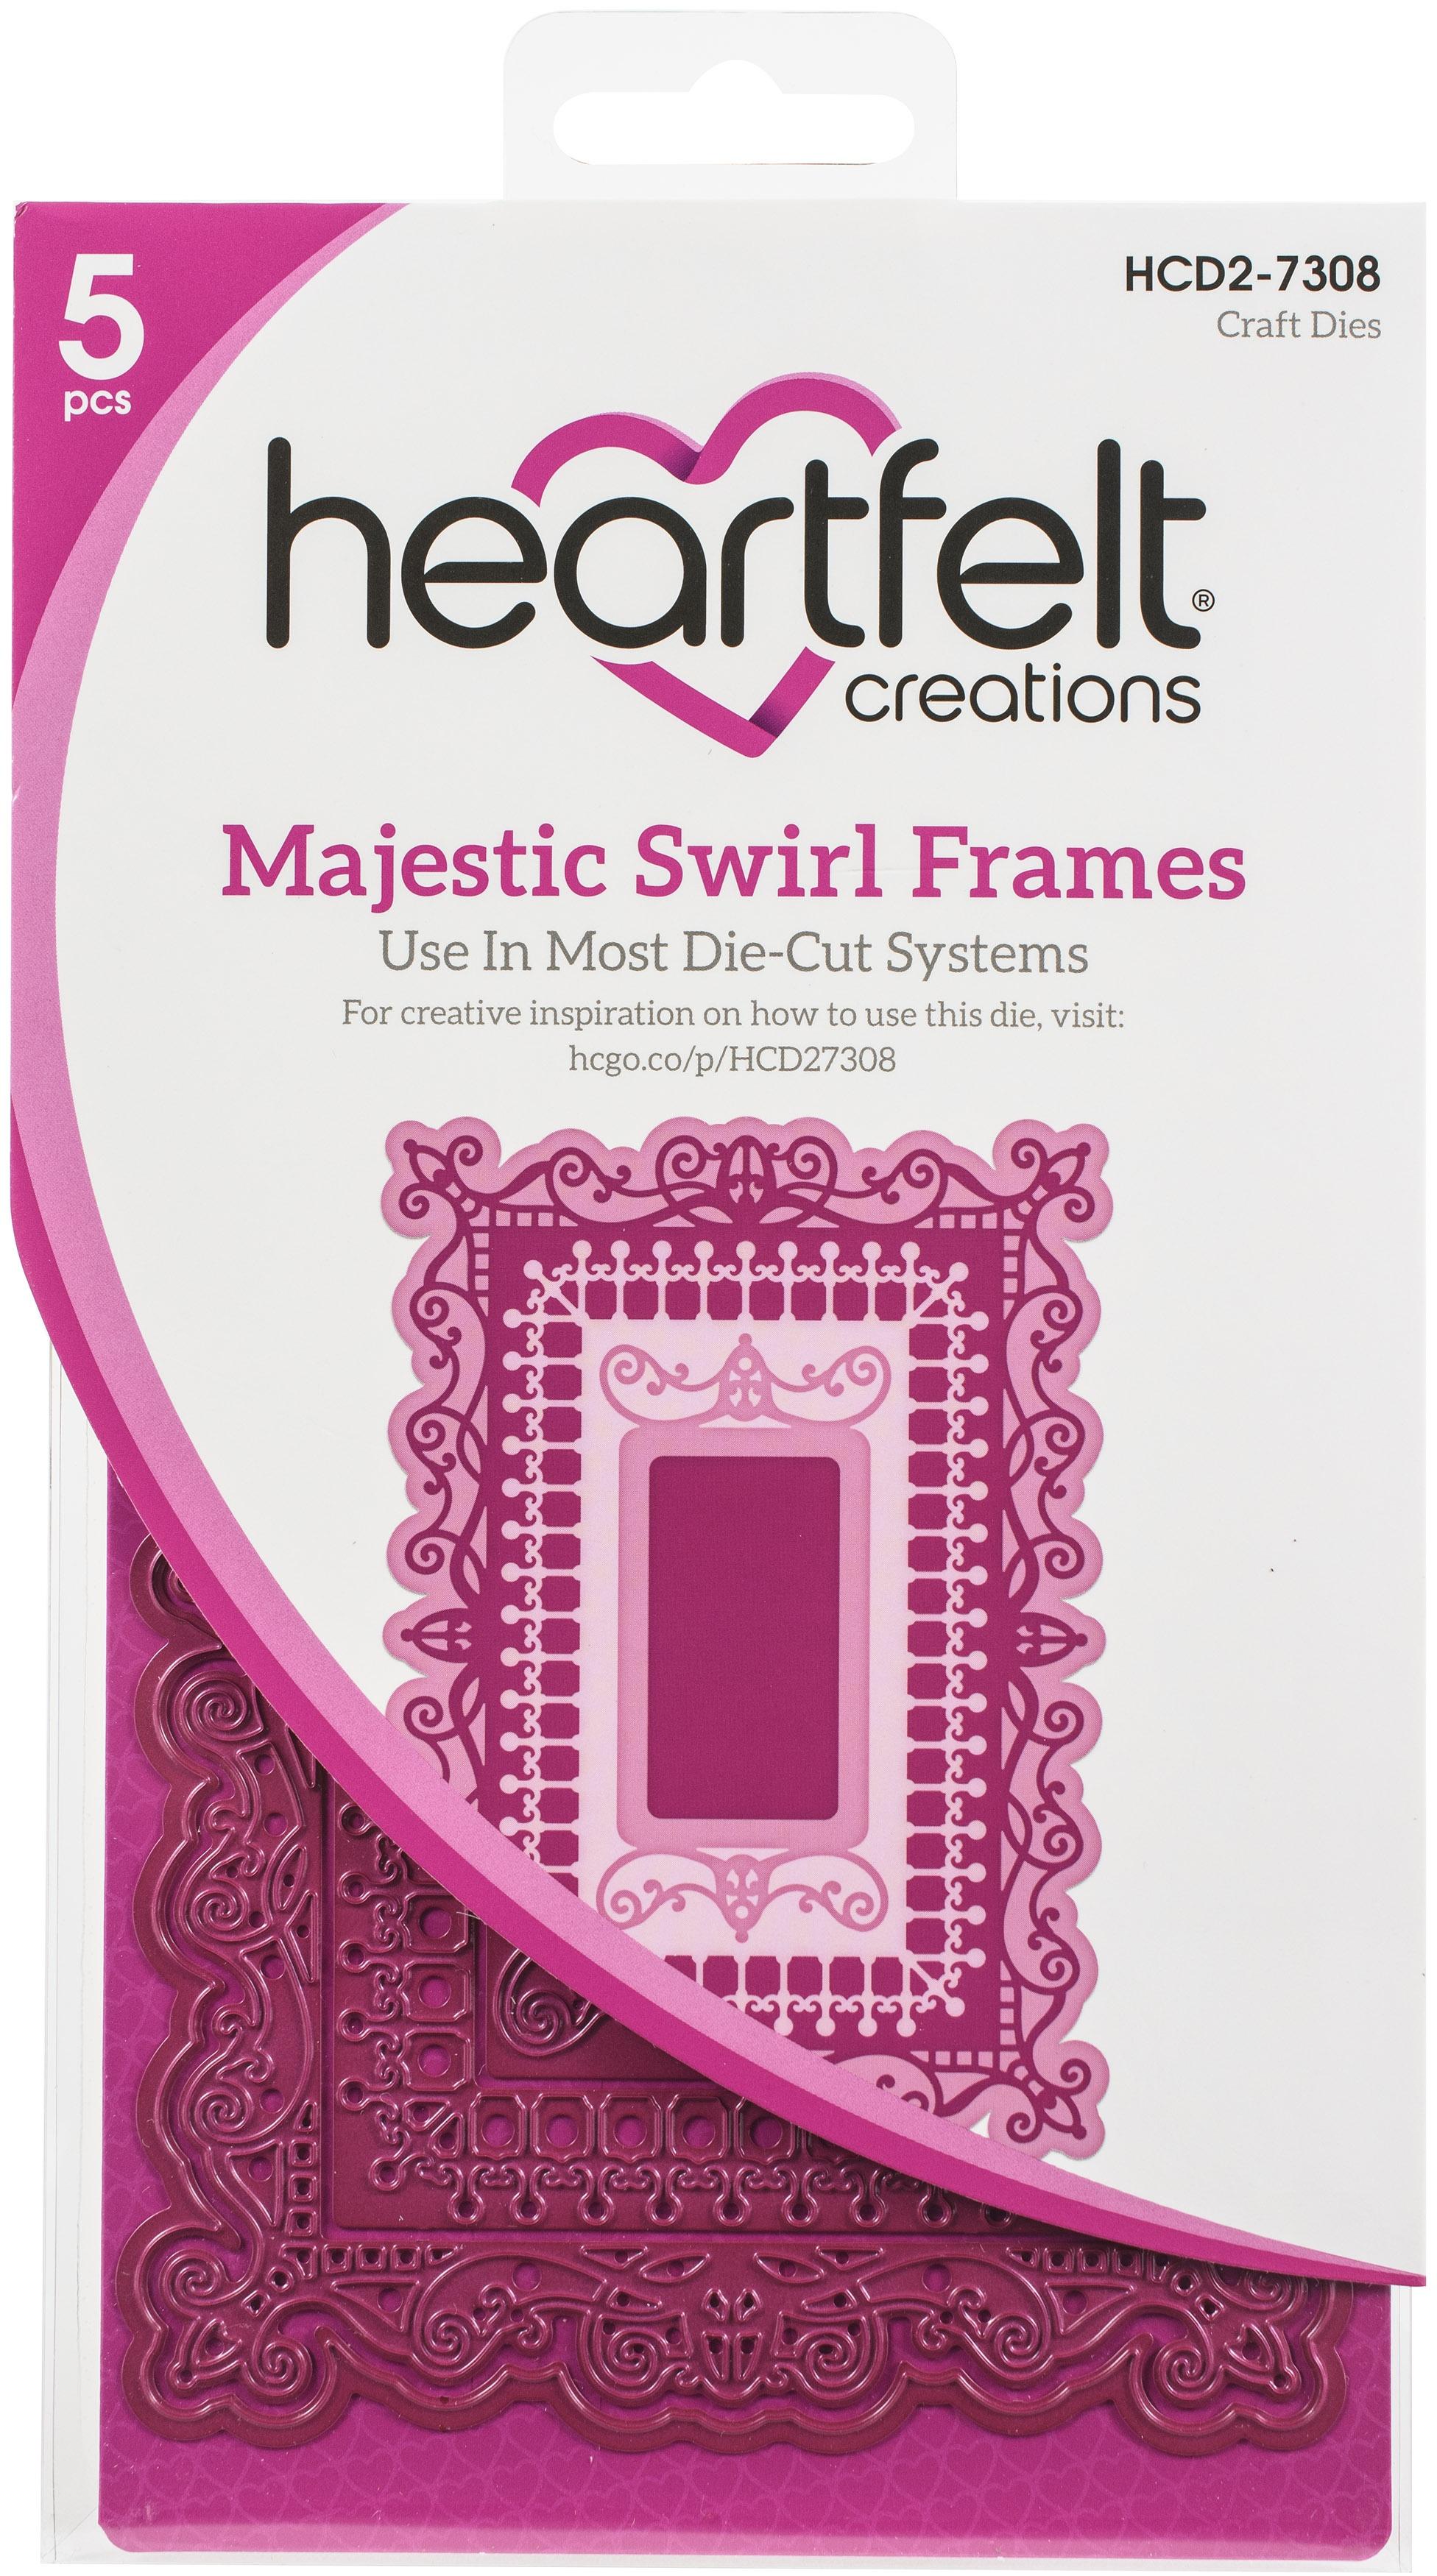 Majestic Swirl Frames